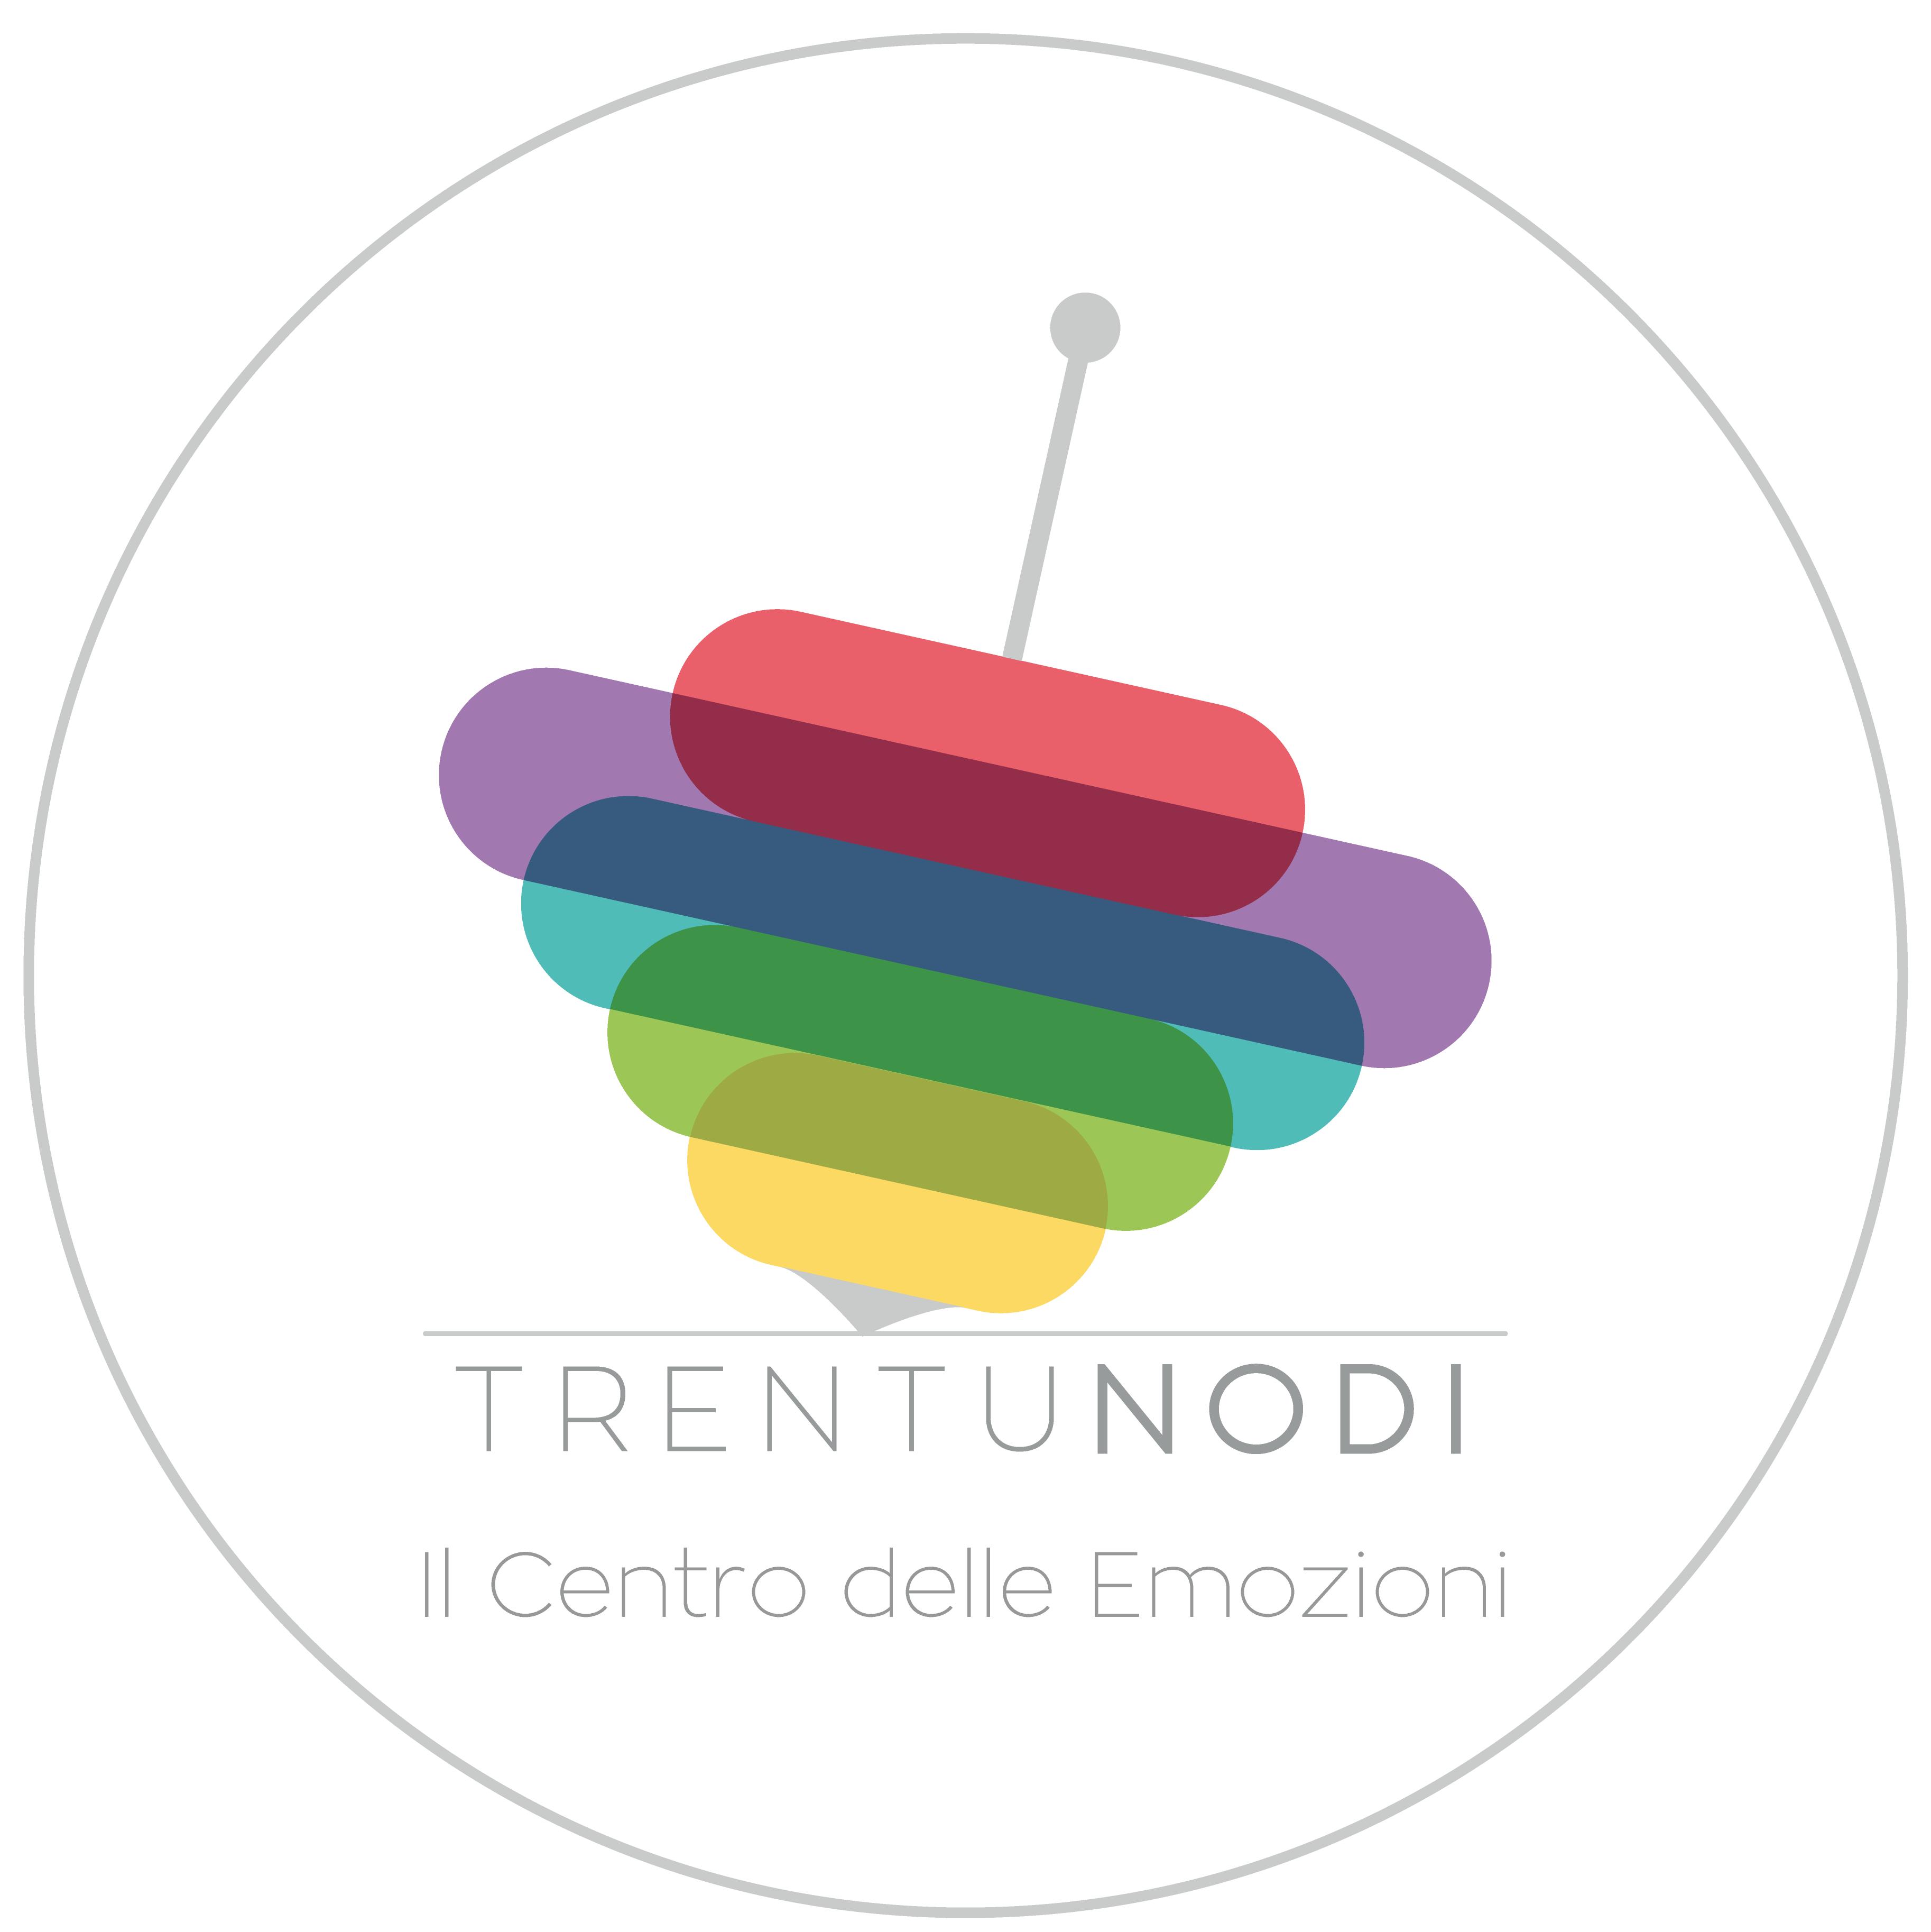 Trentunodi